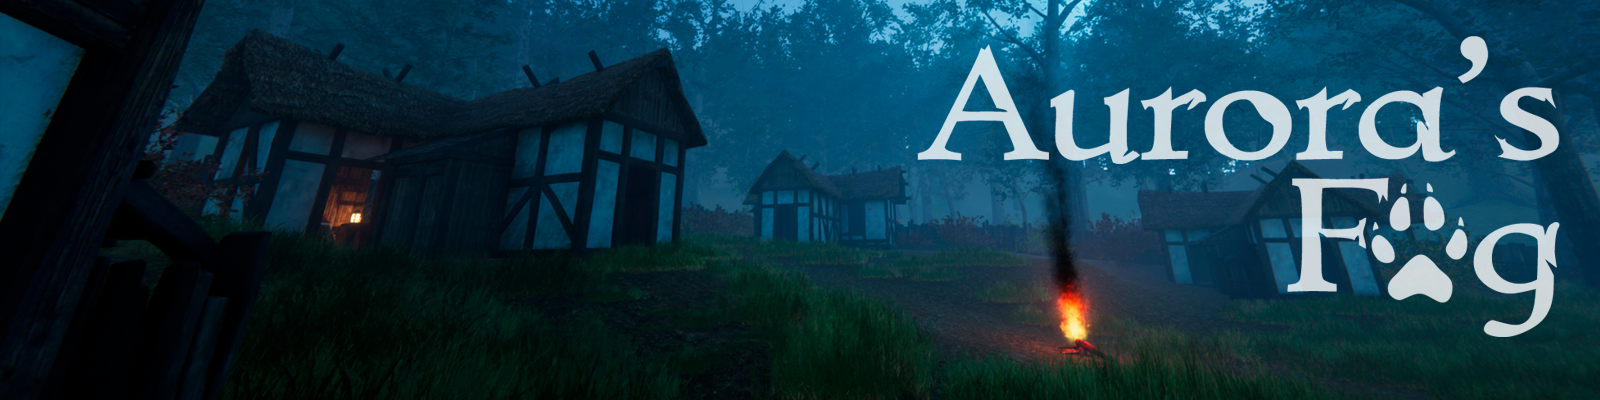 Aurora's Fog